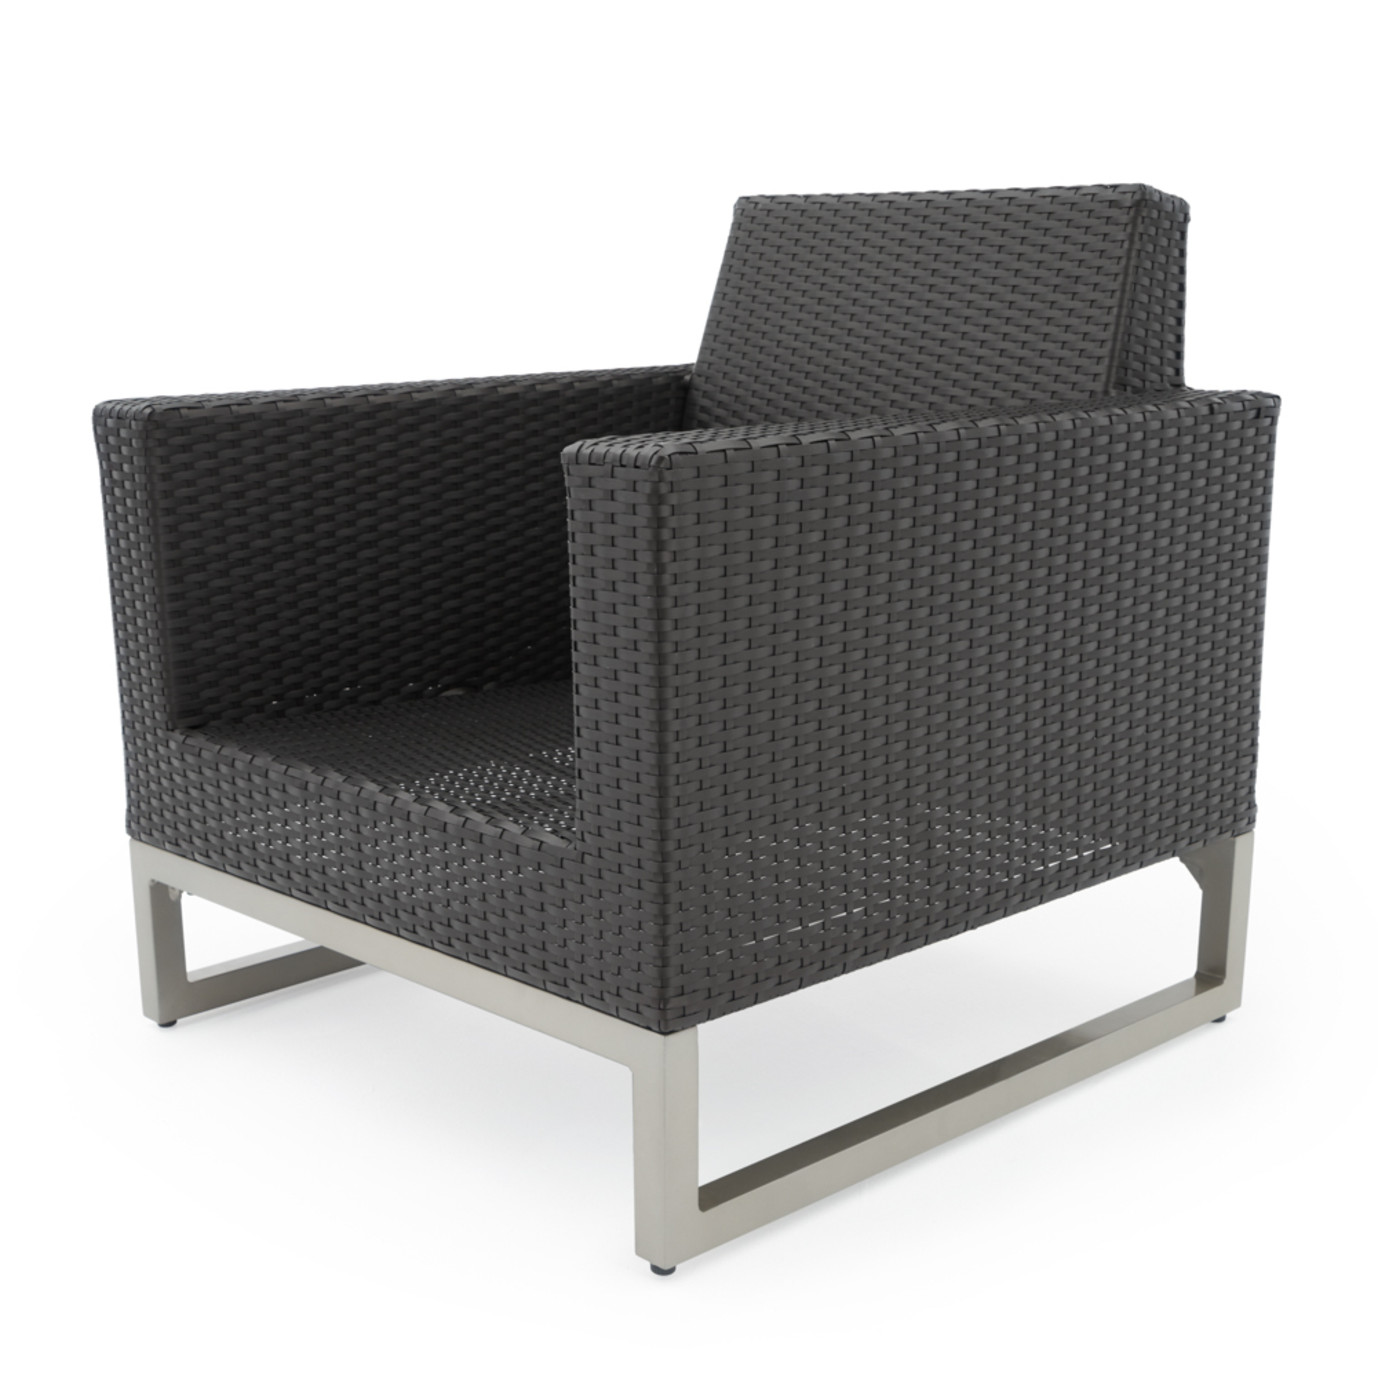 Milo™ Espresso Club Chairs - Navy Blue